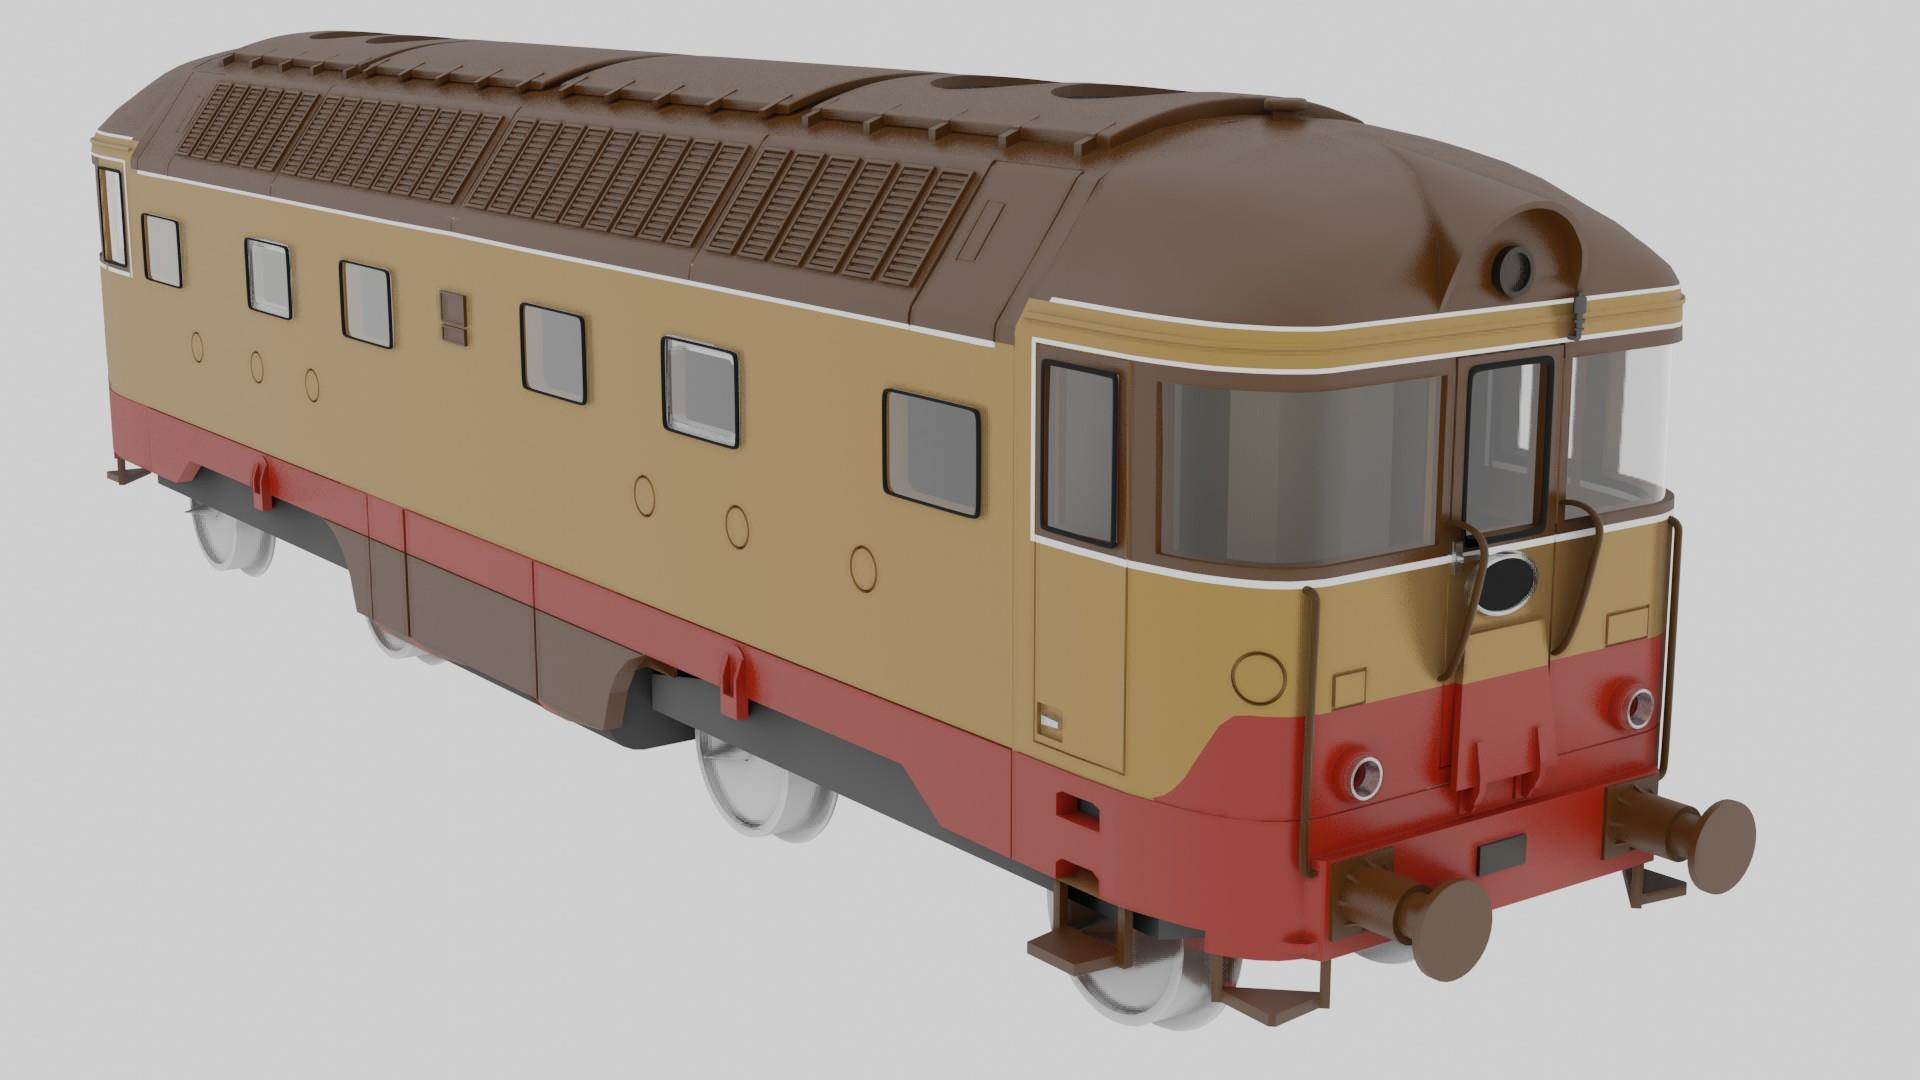 Locomotiva FS D342 in scala HO